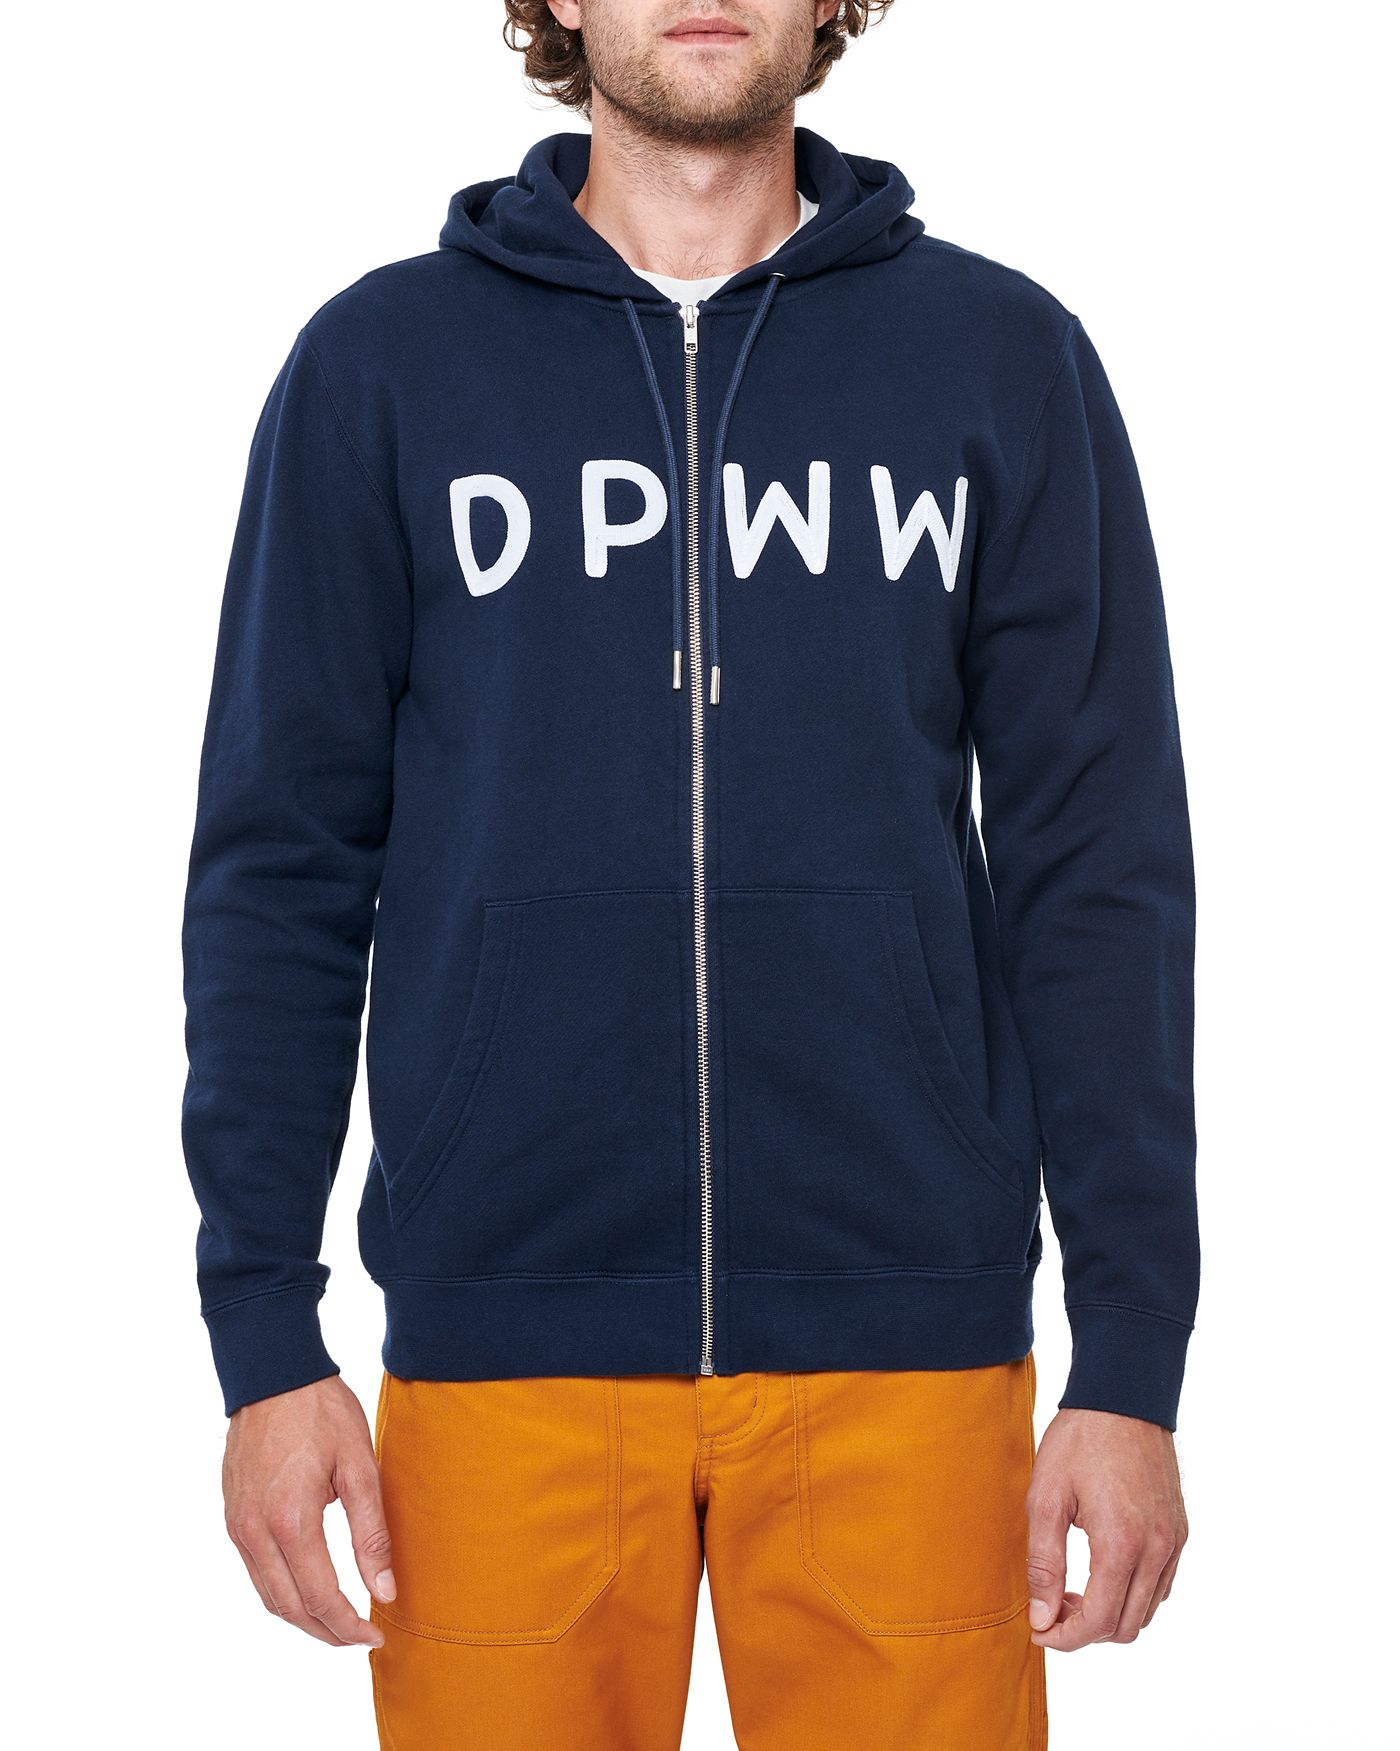 Photo of DPWW Zip Hooded Sweatshirt, Navy